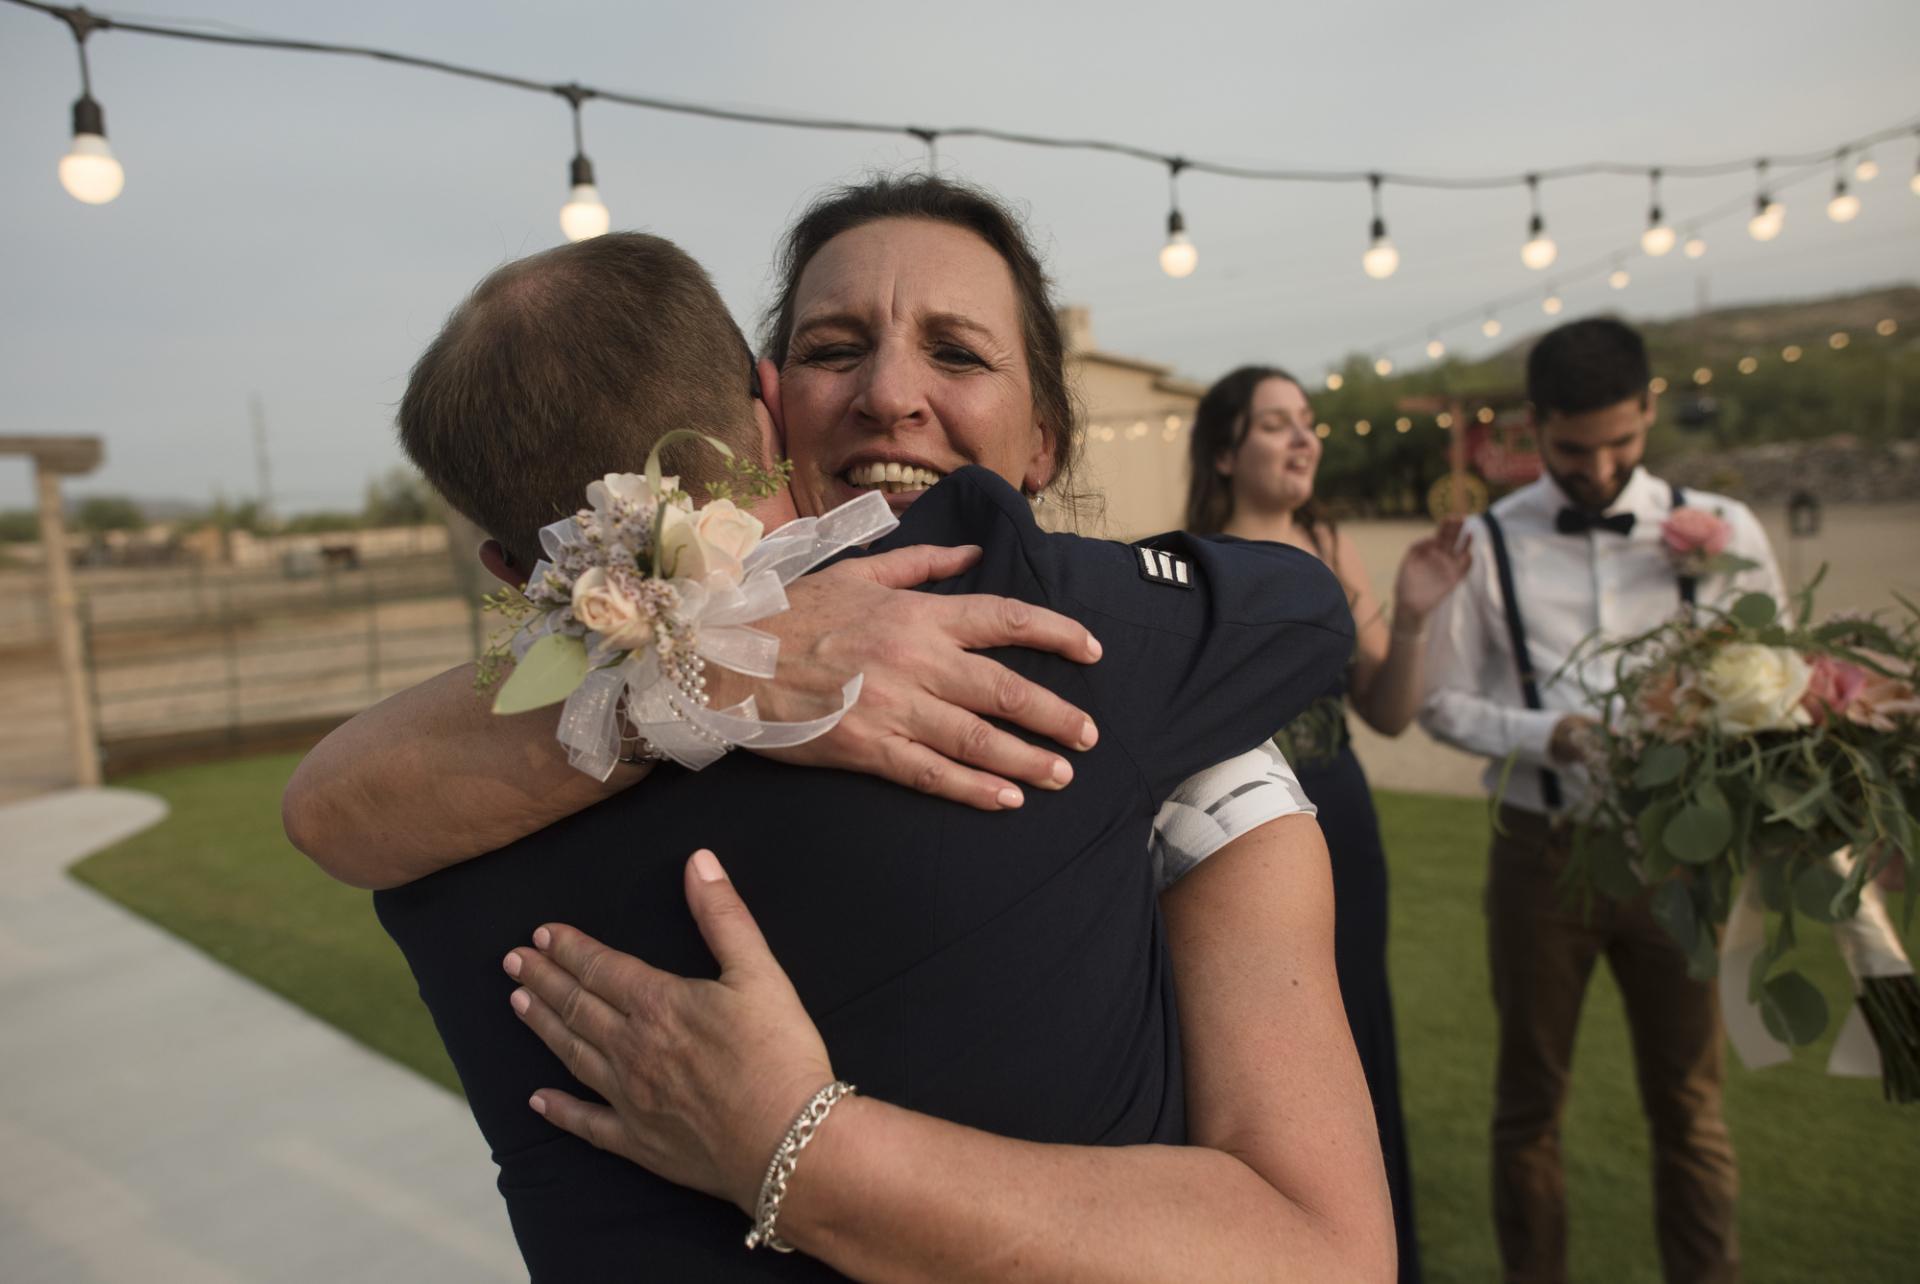 AZ Wedding Photographer | The bride's mother hugs the groom